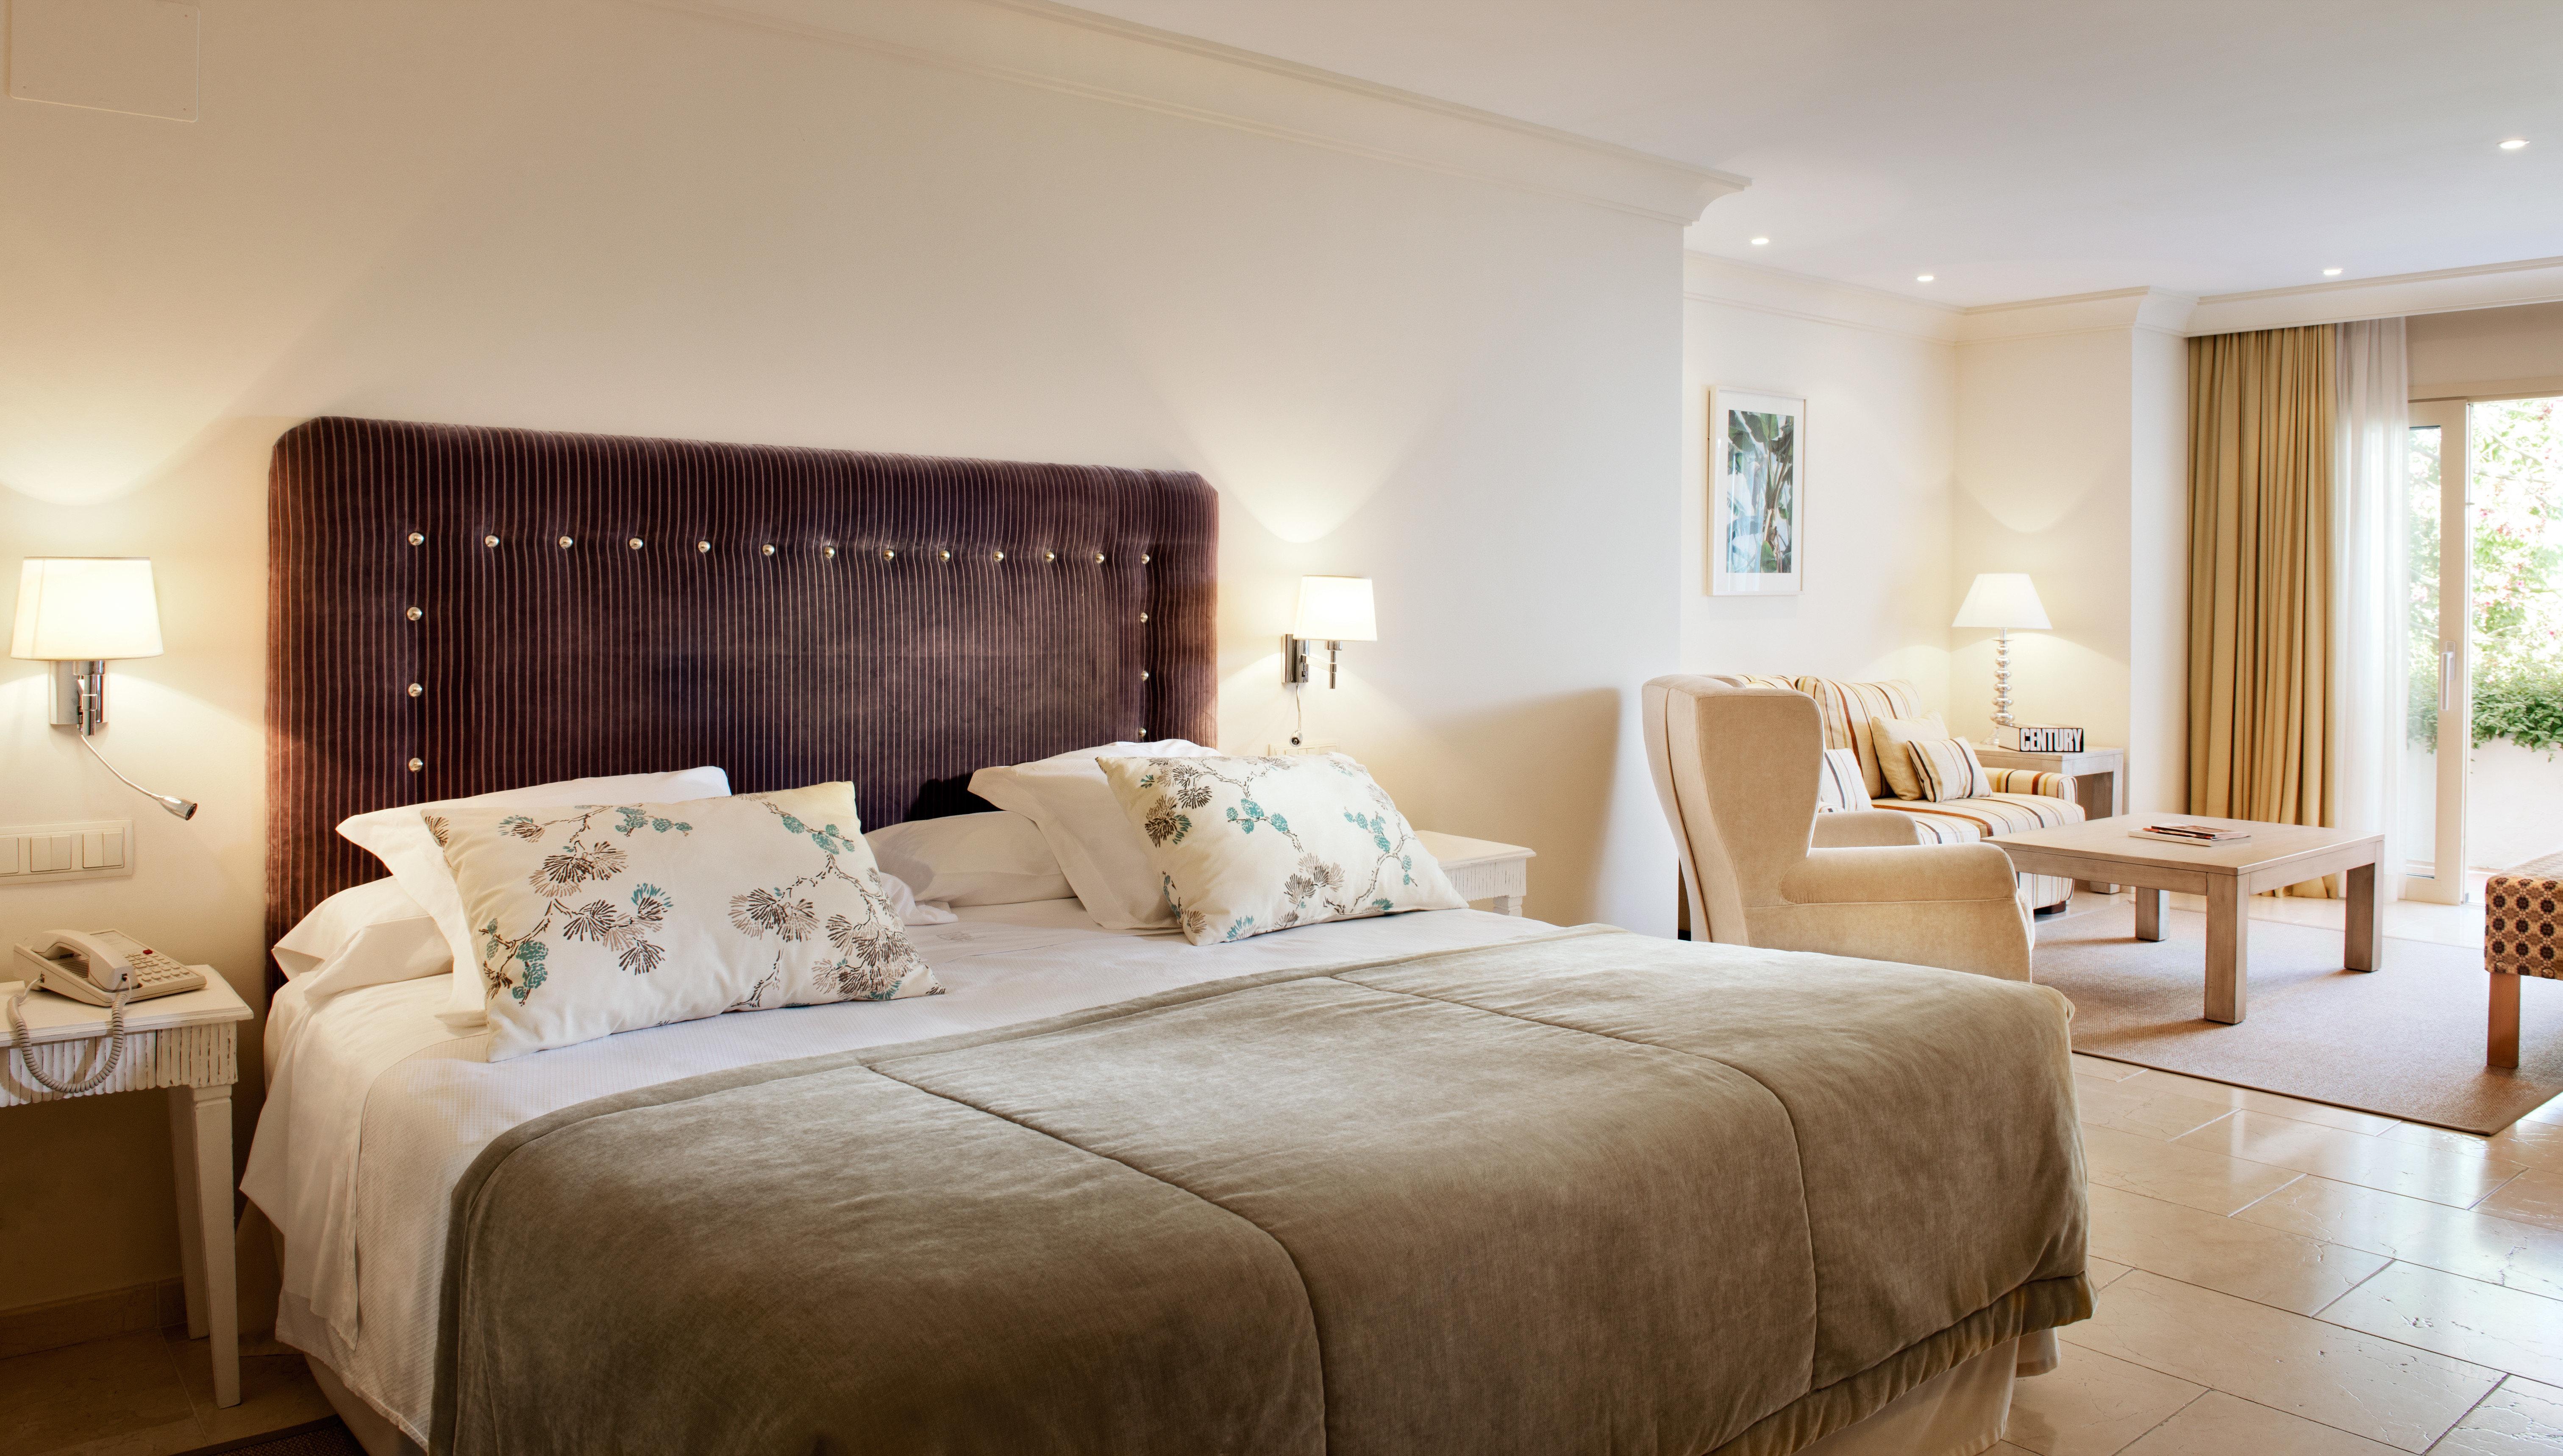 Bedroom Lounge Luxury Modern Suite sofa property scene living room home cottage tan